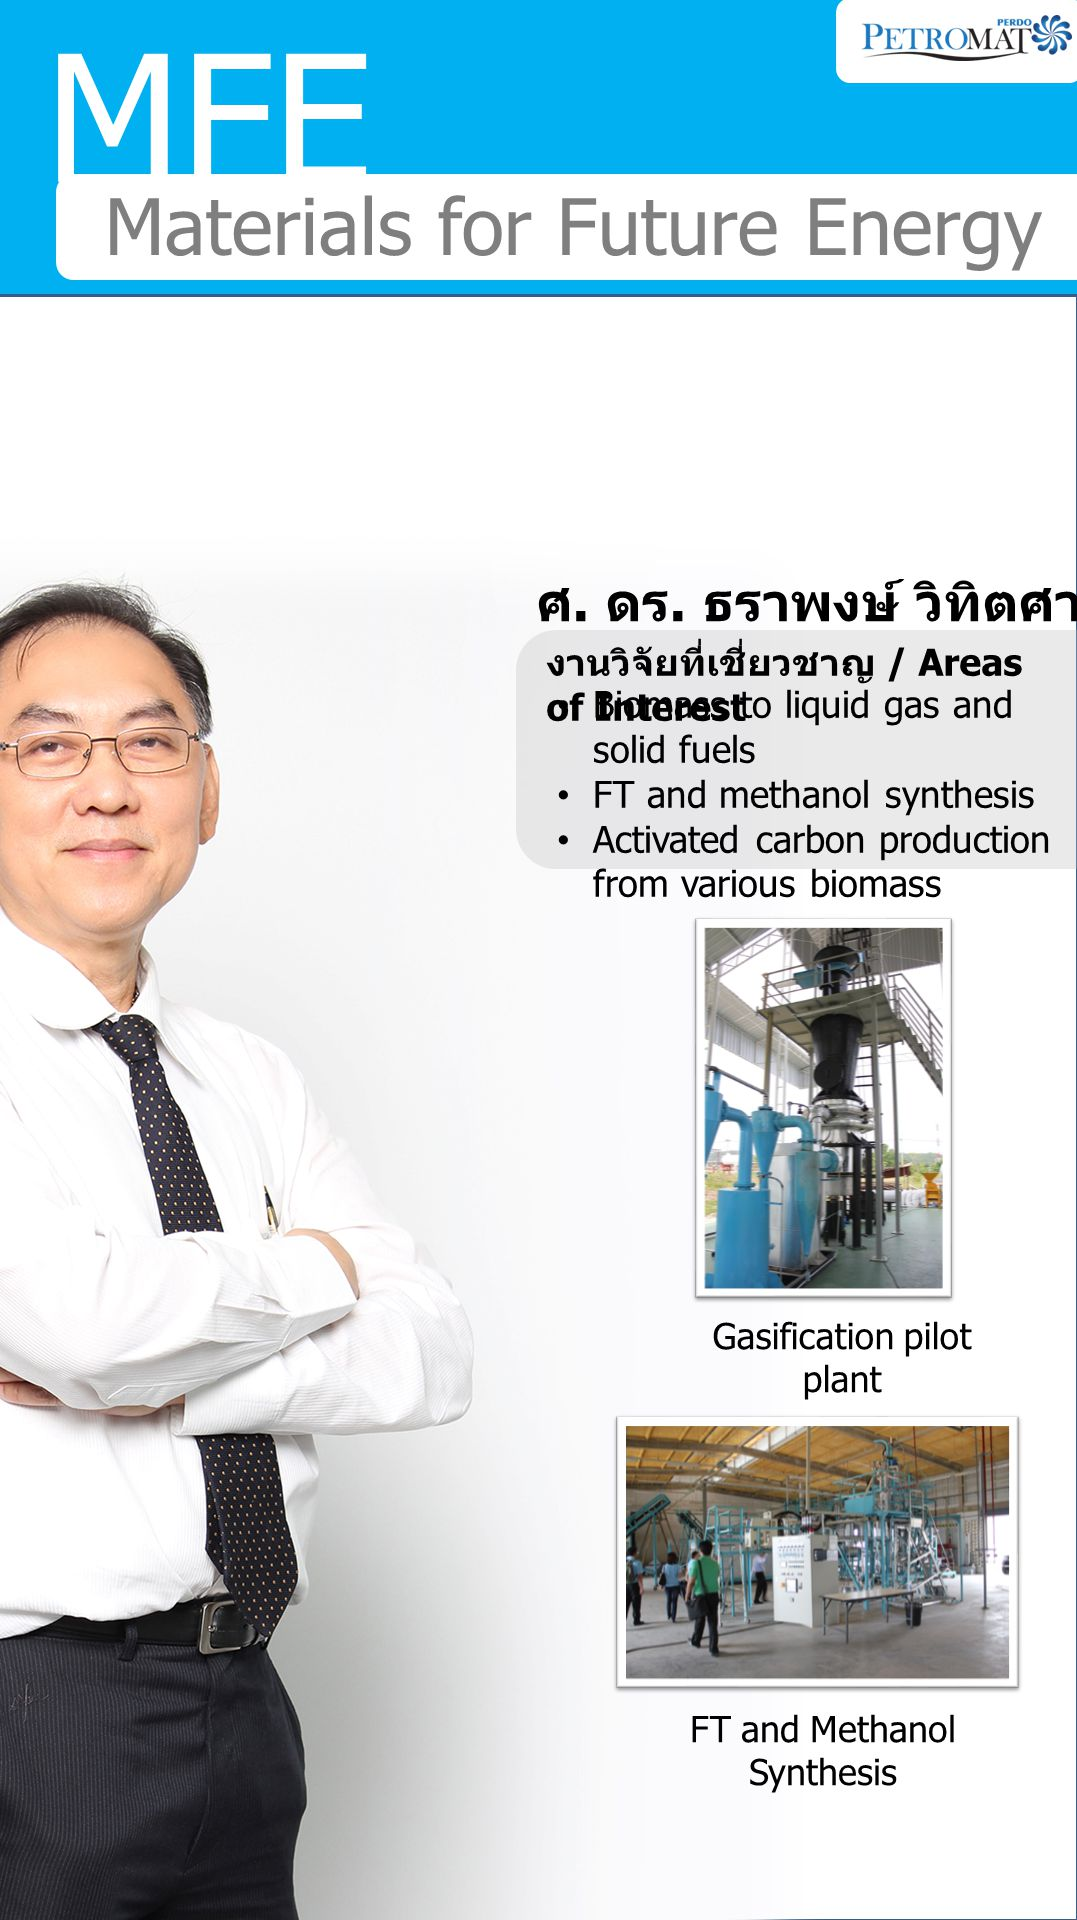 MFE Materials for Future Energy ศ. ดร. ธราพงษ์ วิทิตศานต์